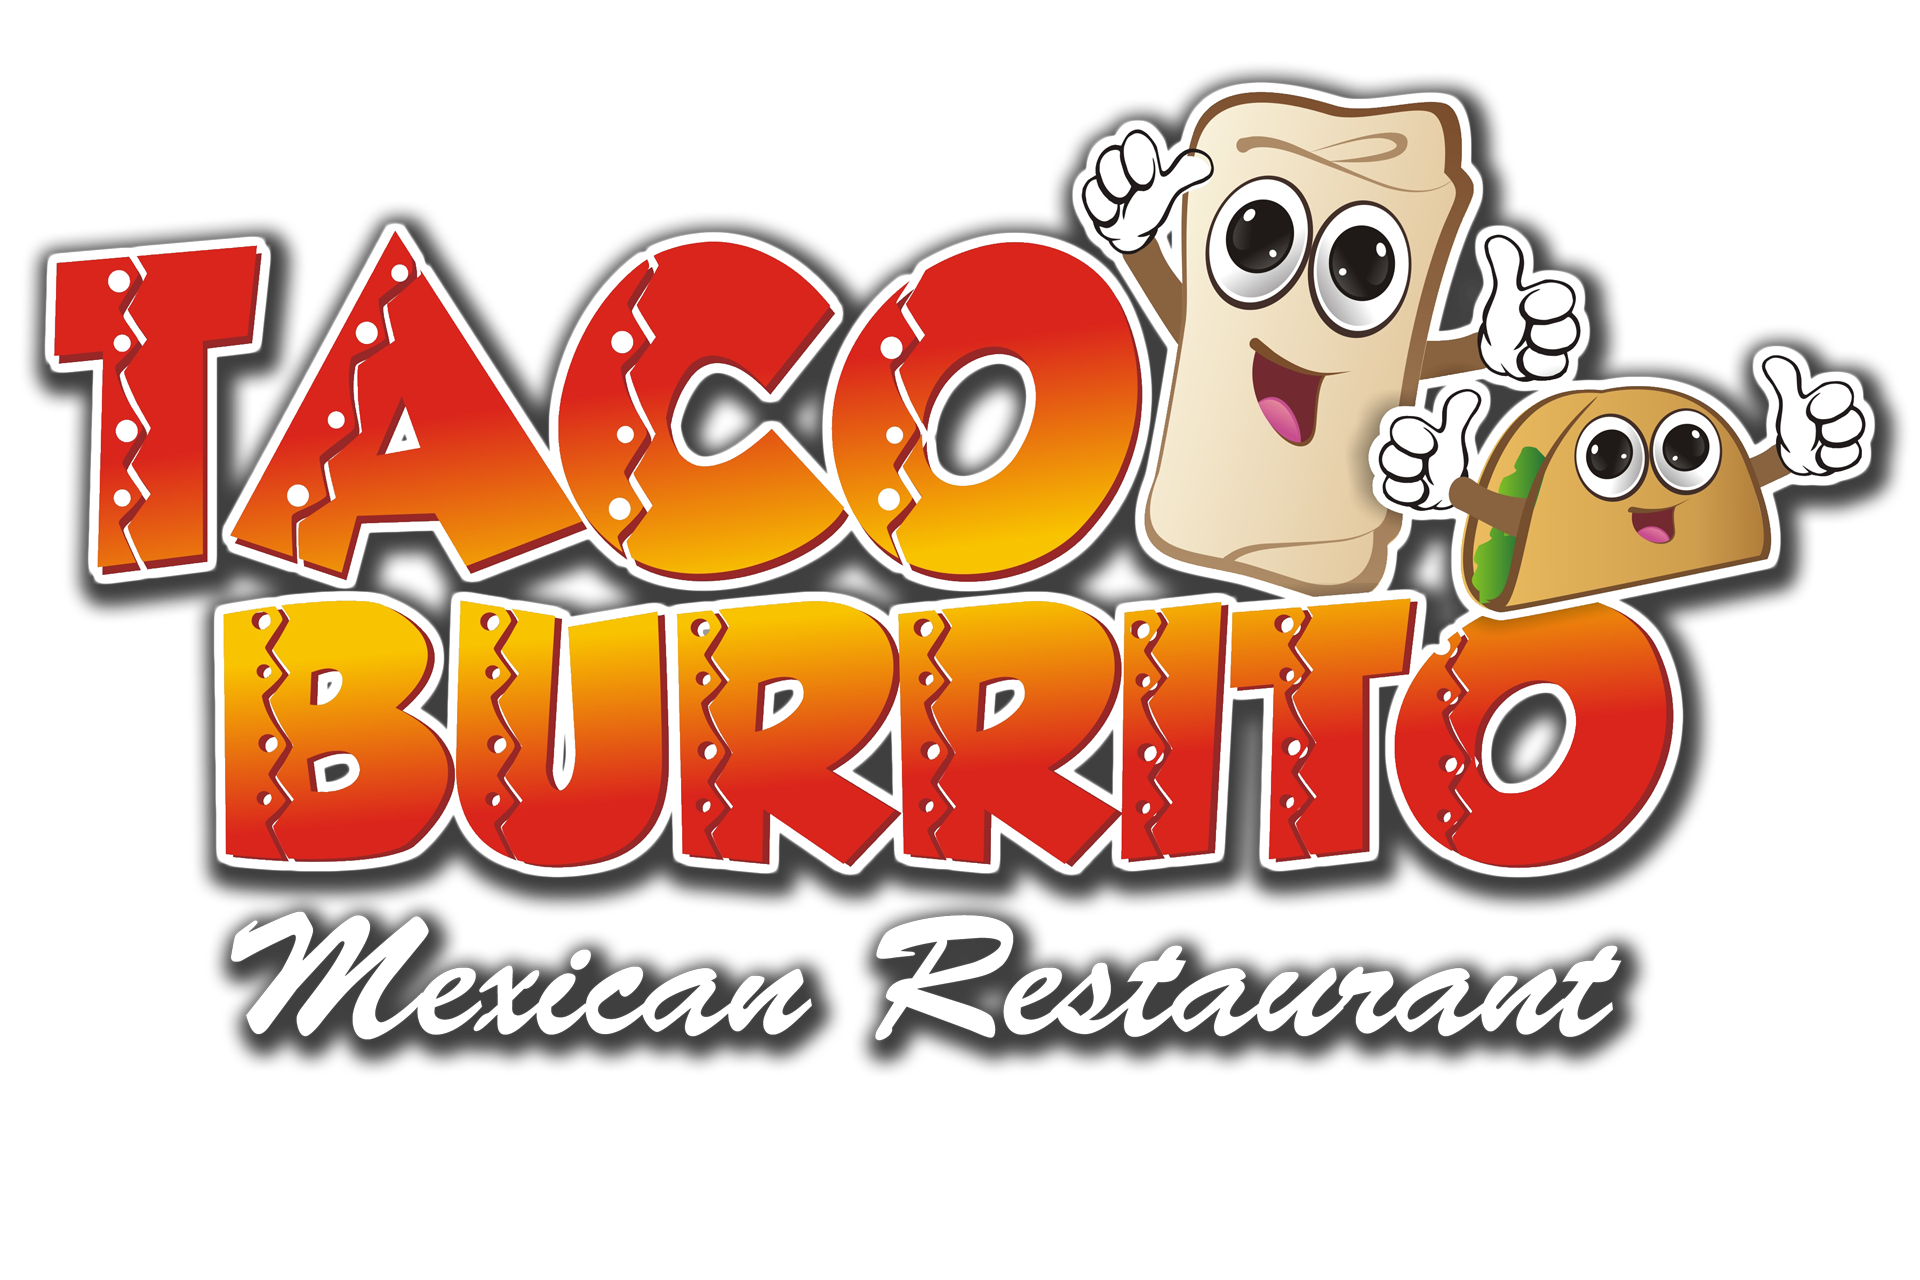 png library download Taco burrito mexican restaurant. Tacos clipart burito.